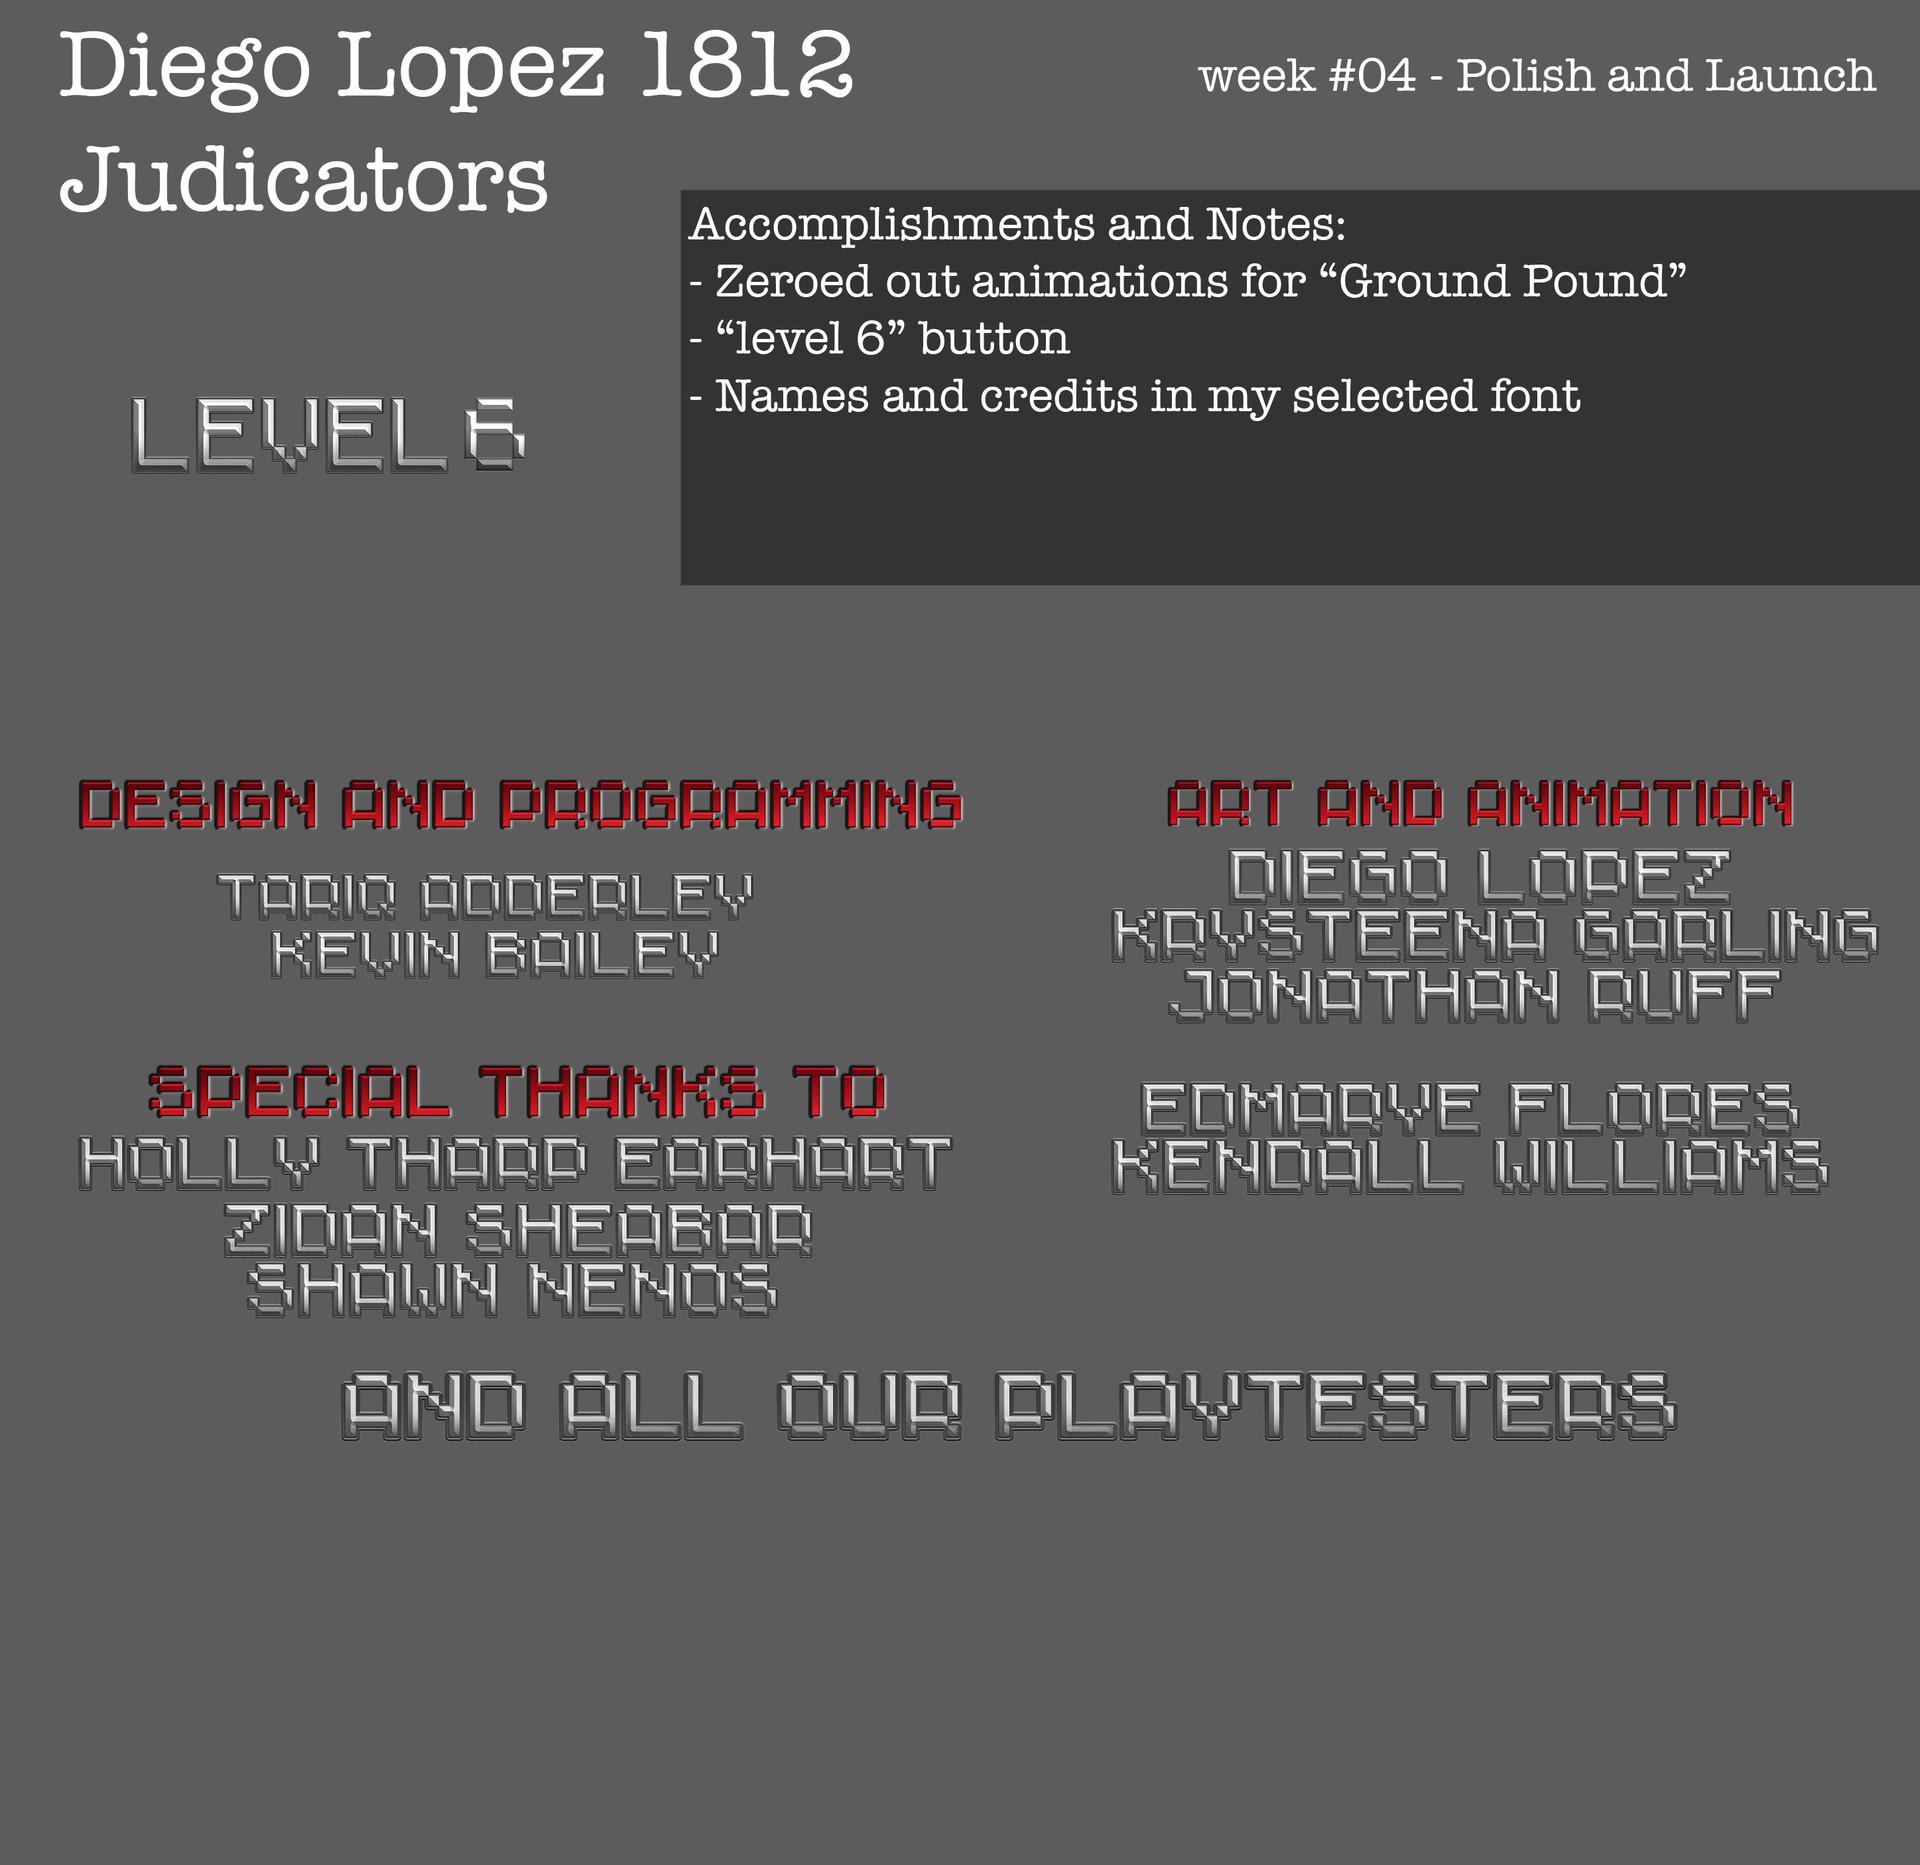 Diego sebastian reid lopez lopezd 1812 judicators wk4